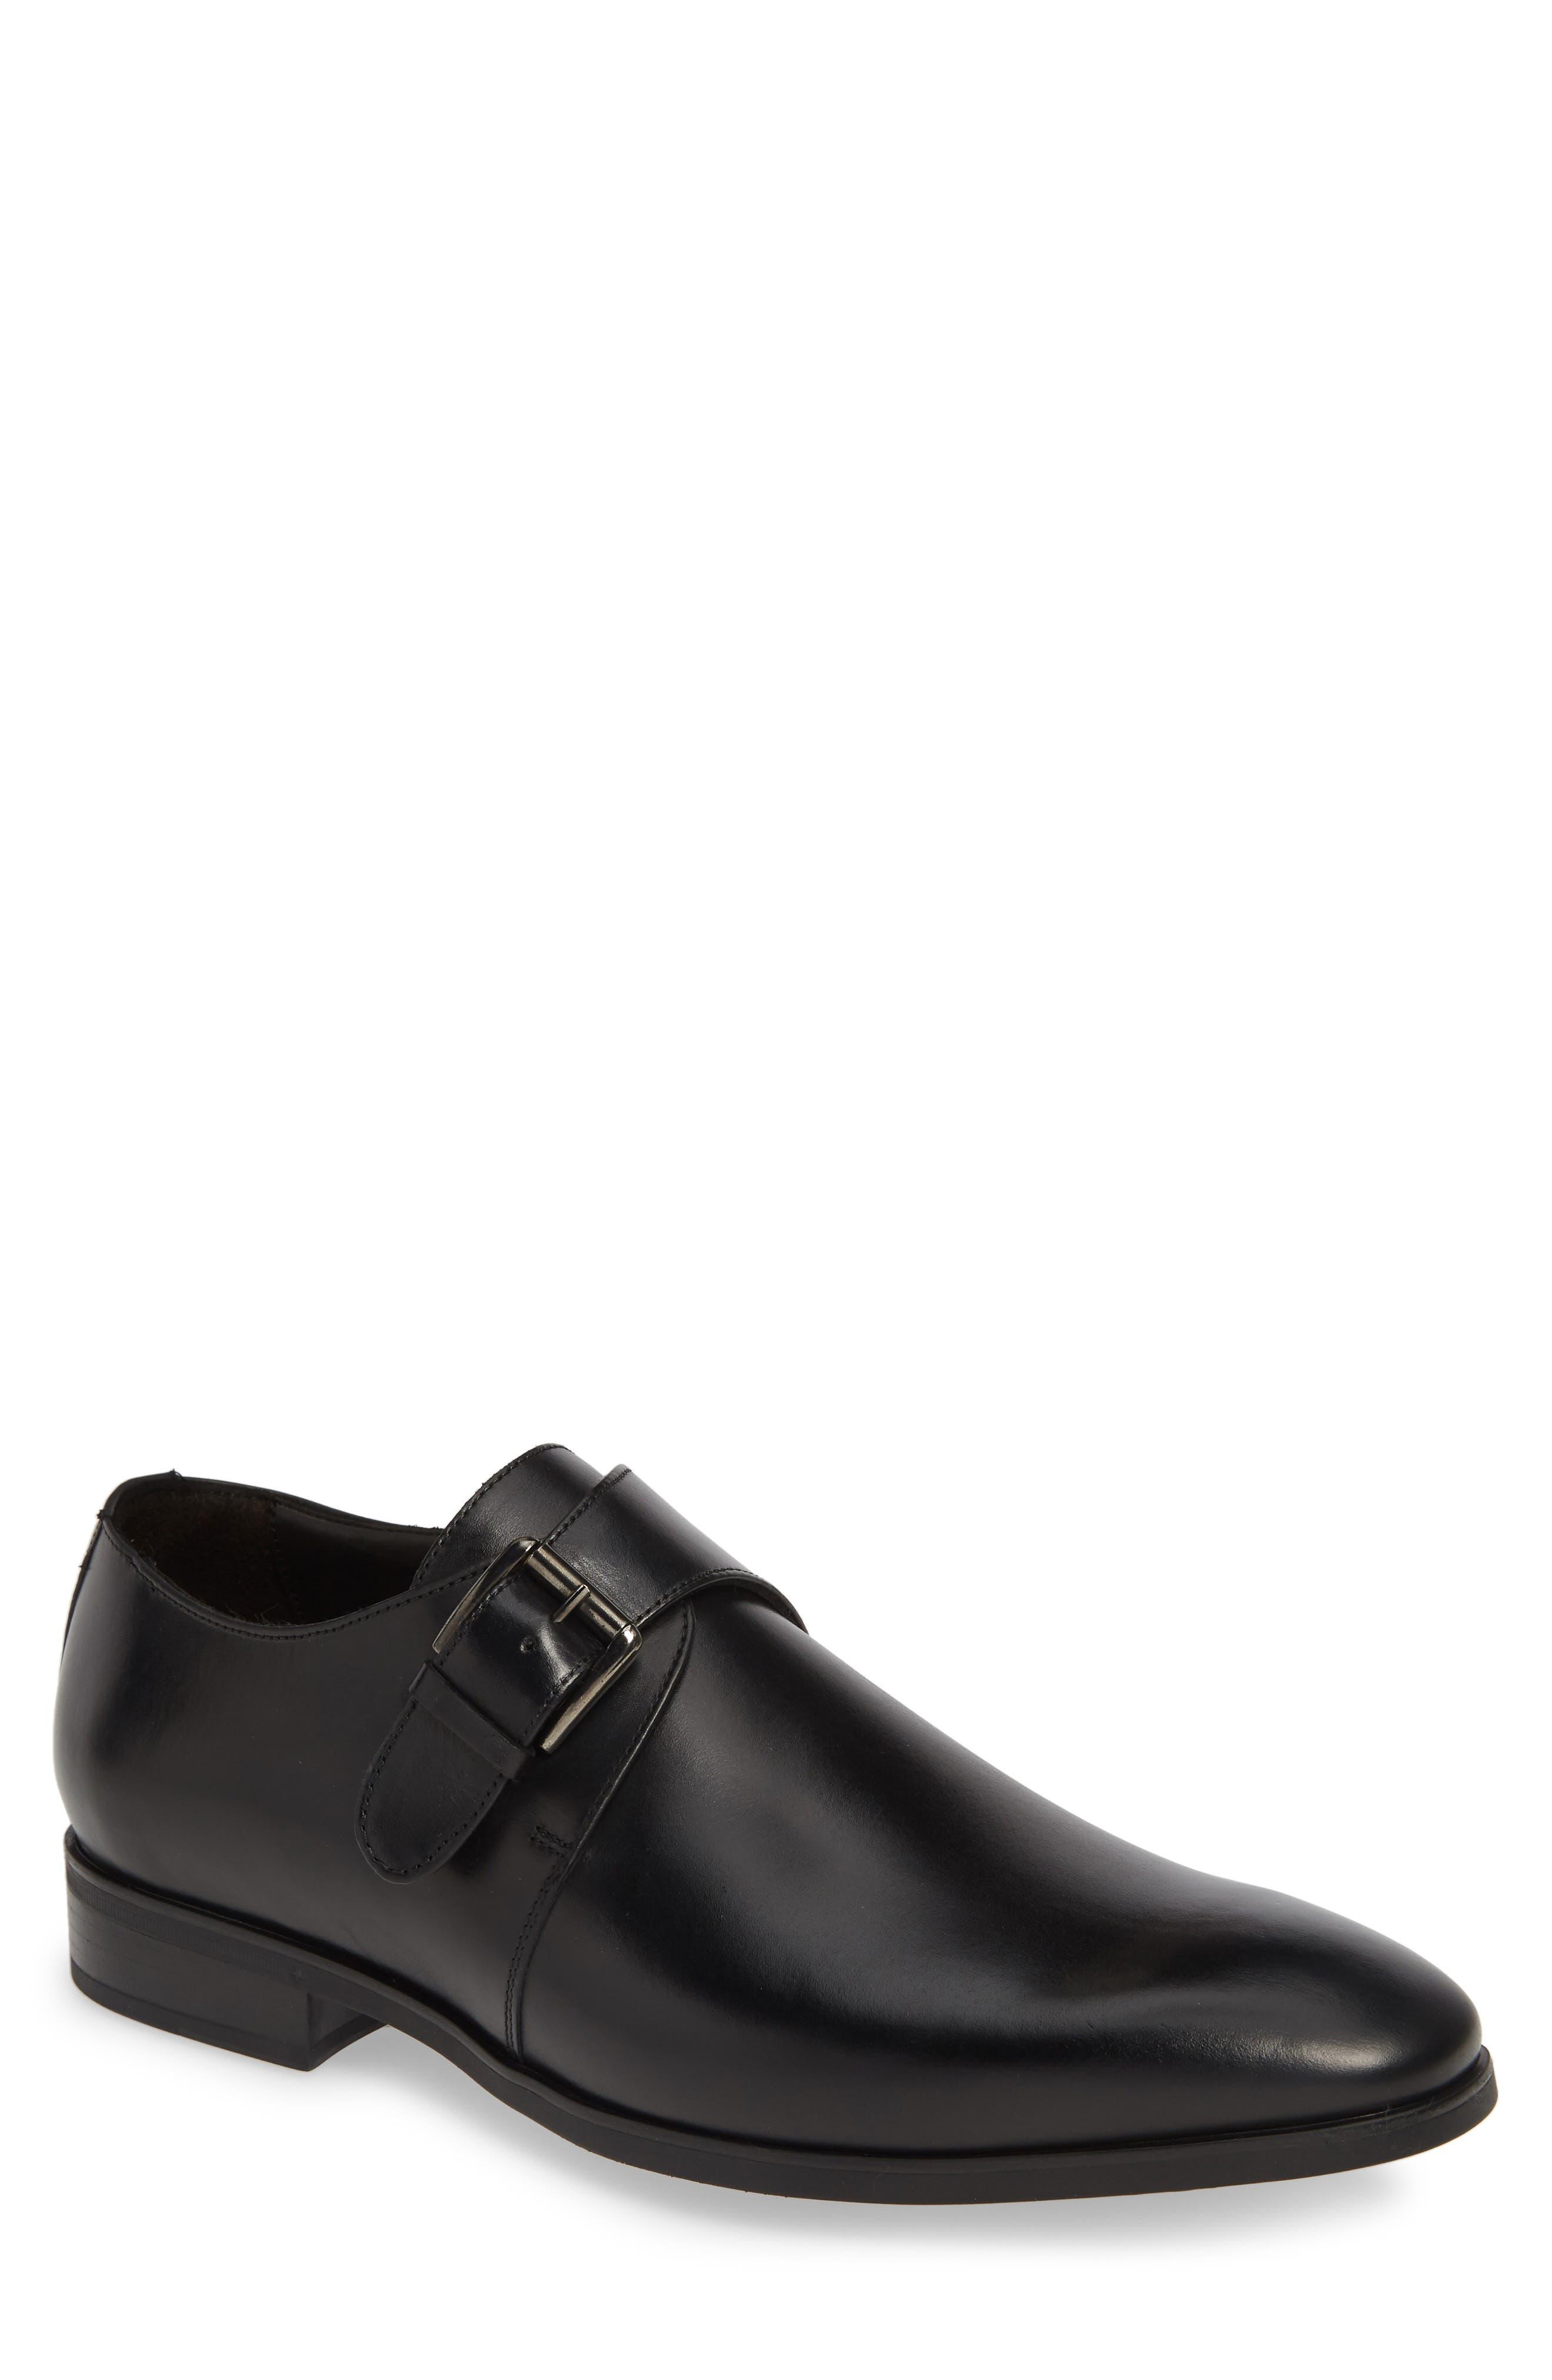 Scarpa Monk Strap Shoe,                             Main thumbnail 1, color,                             BLACK LEATHER